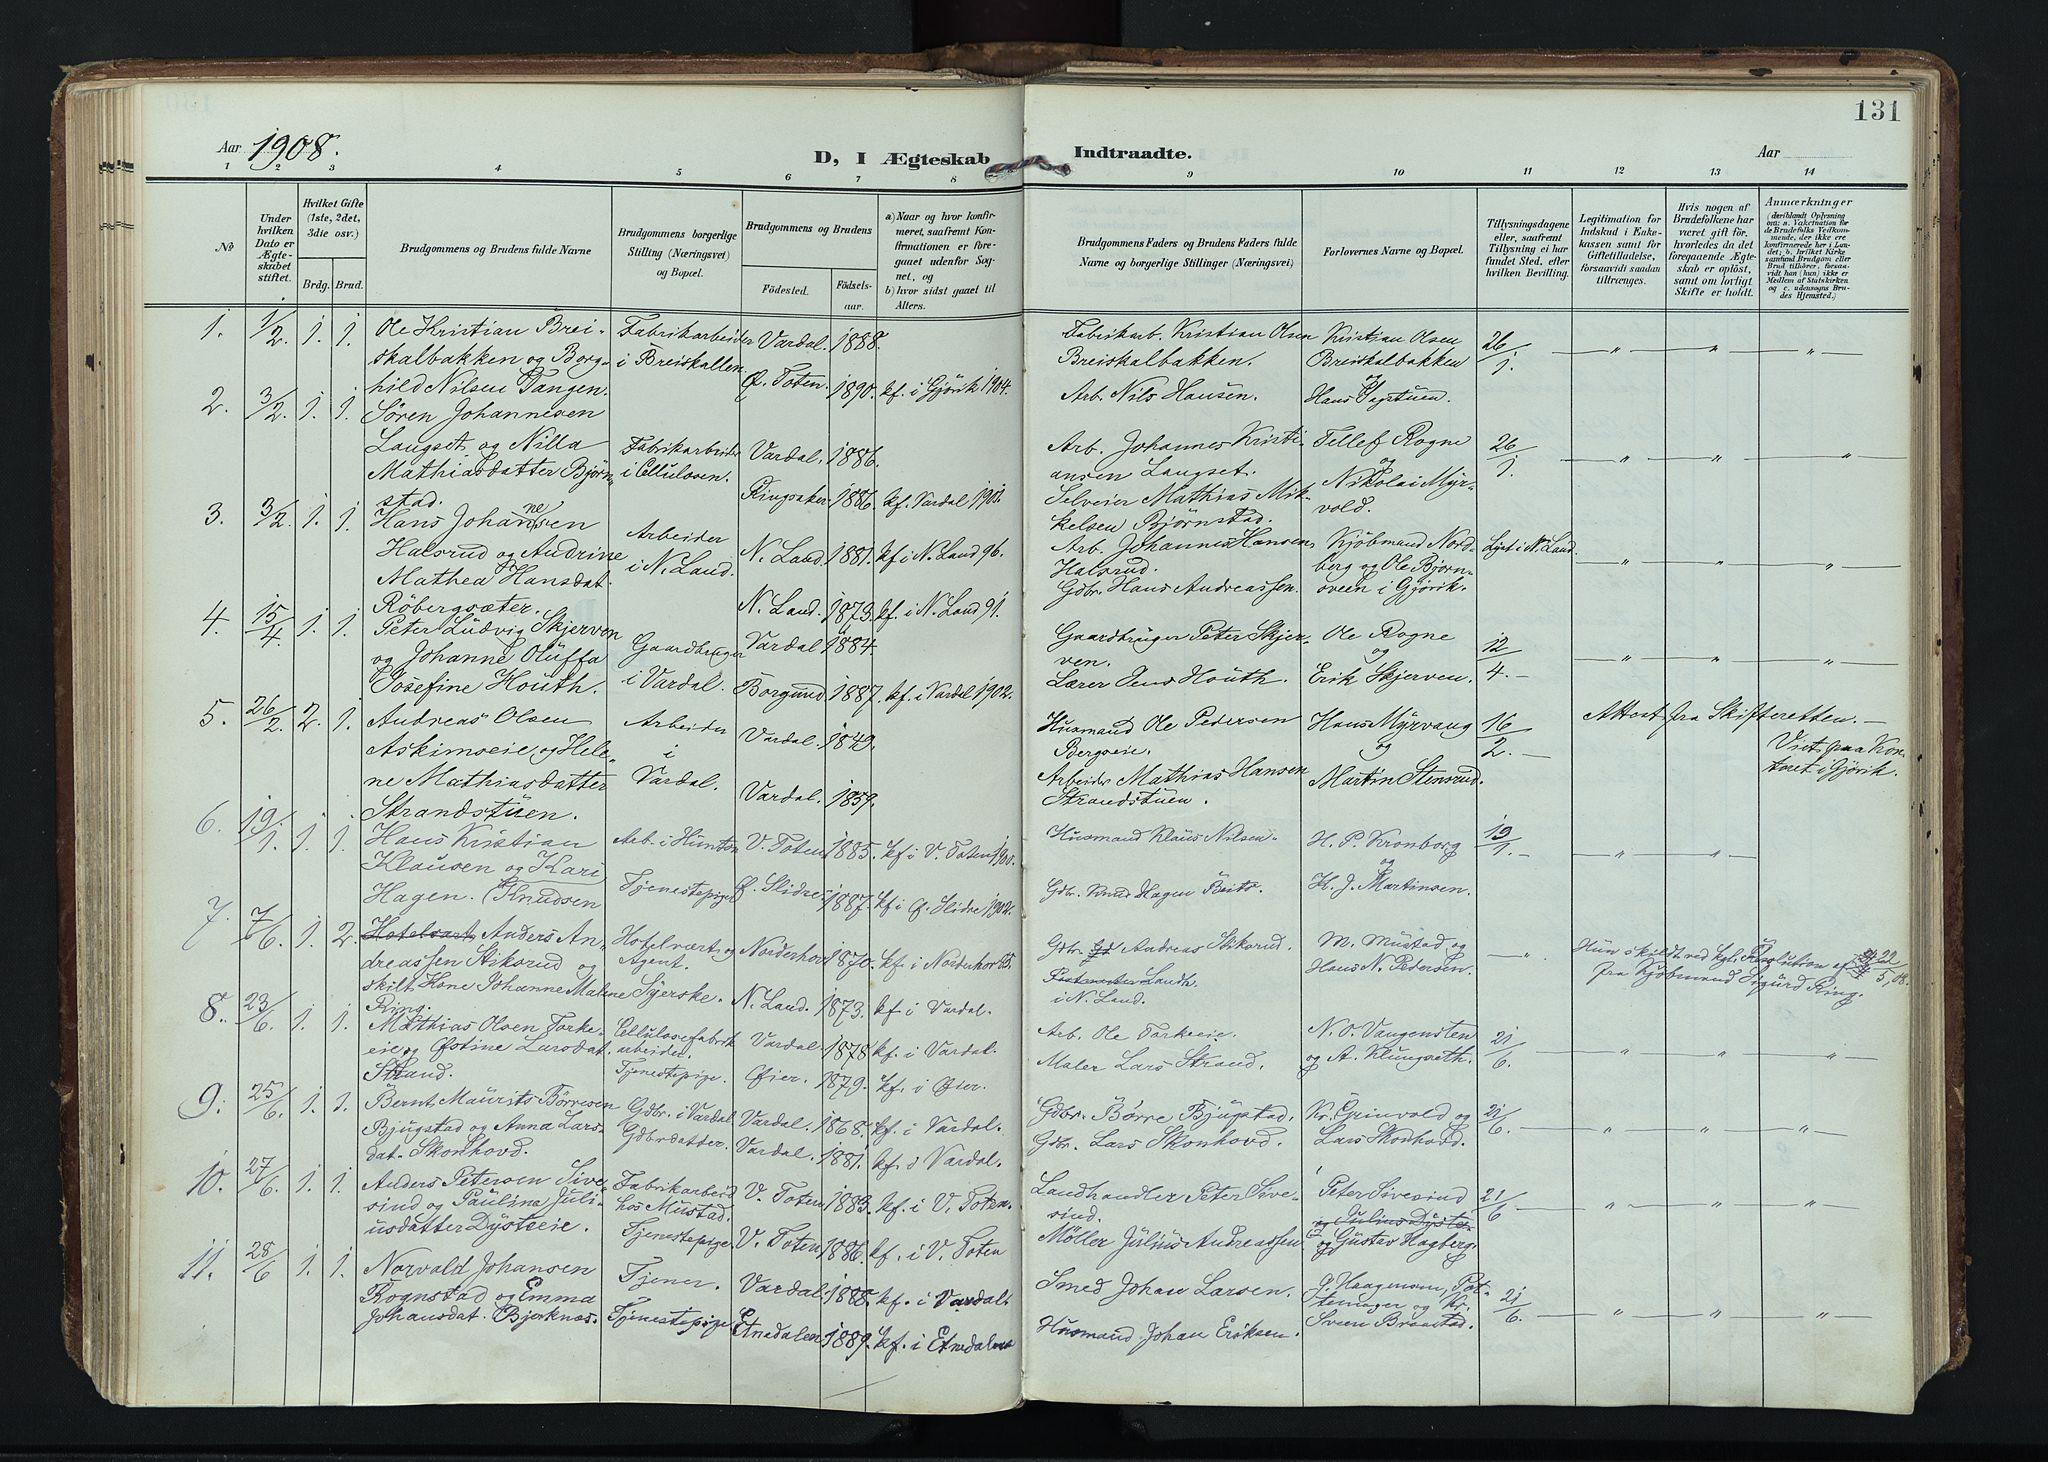 SAH, Vardal prestekontor, H/Ha/Haa/L0020: Ministerialbok nr. 20, 1907-1921, s. 131